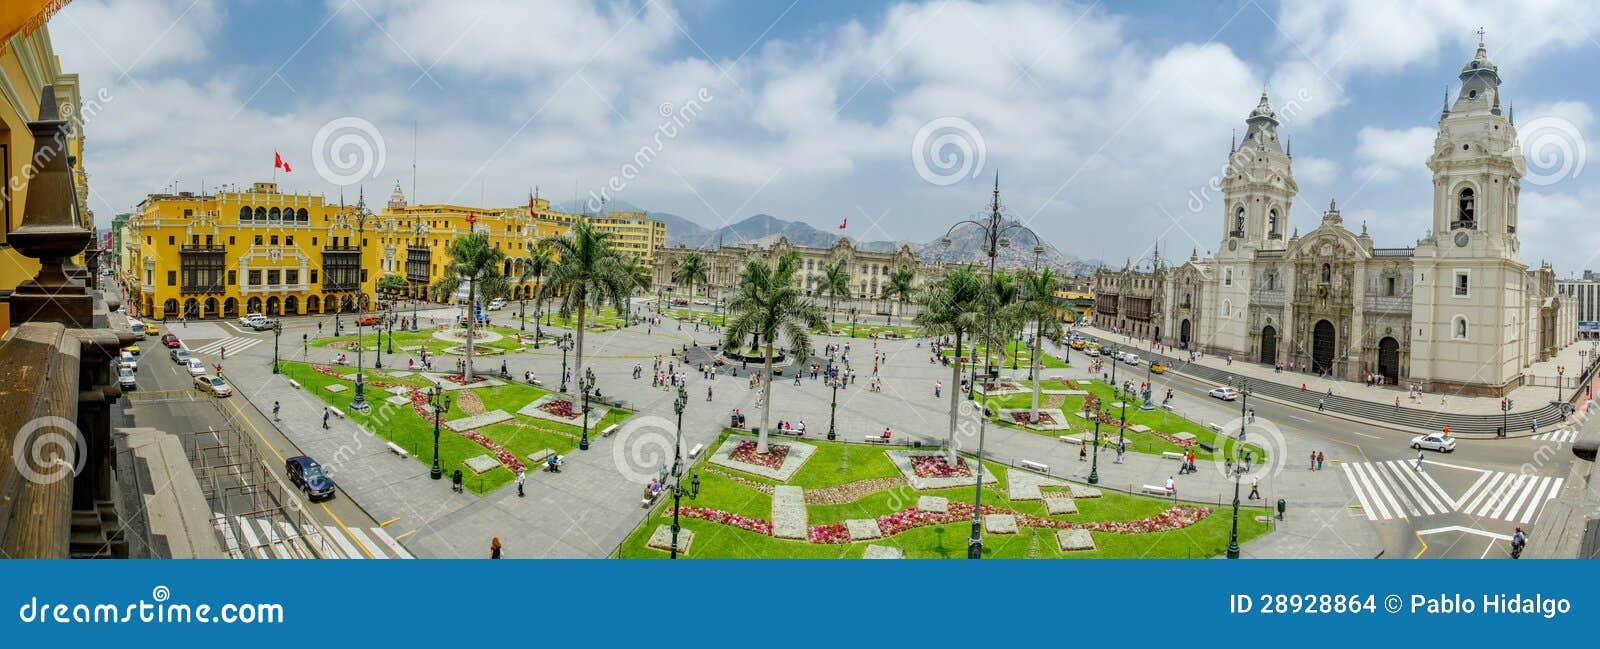 Plazaen de armas i Lima, Peru 180 beskådar